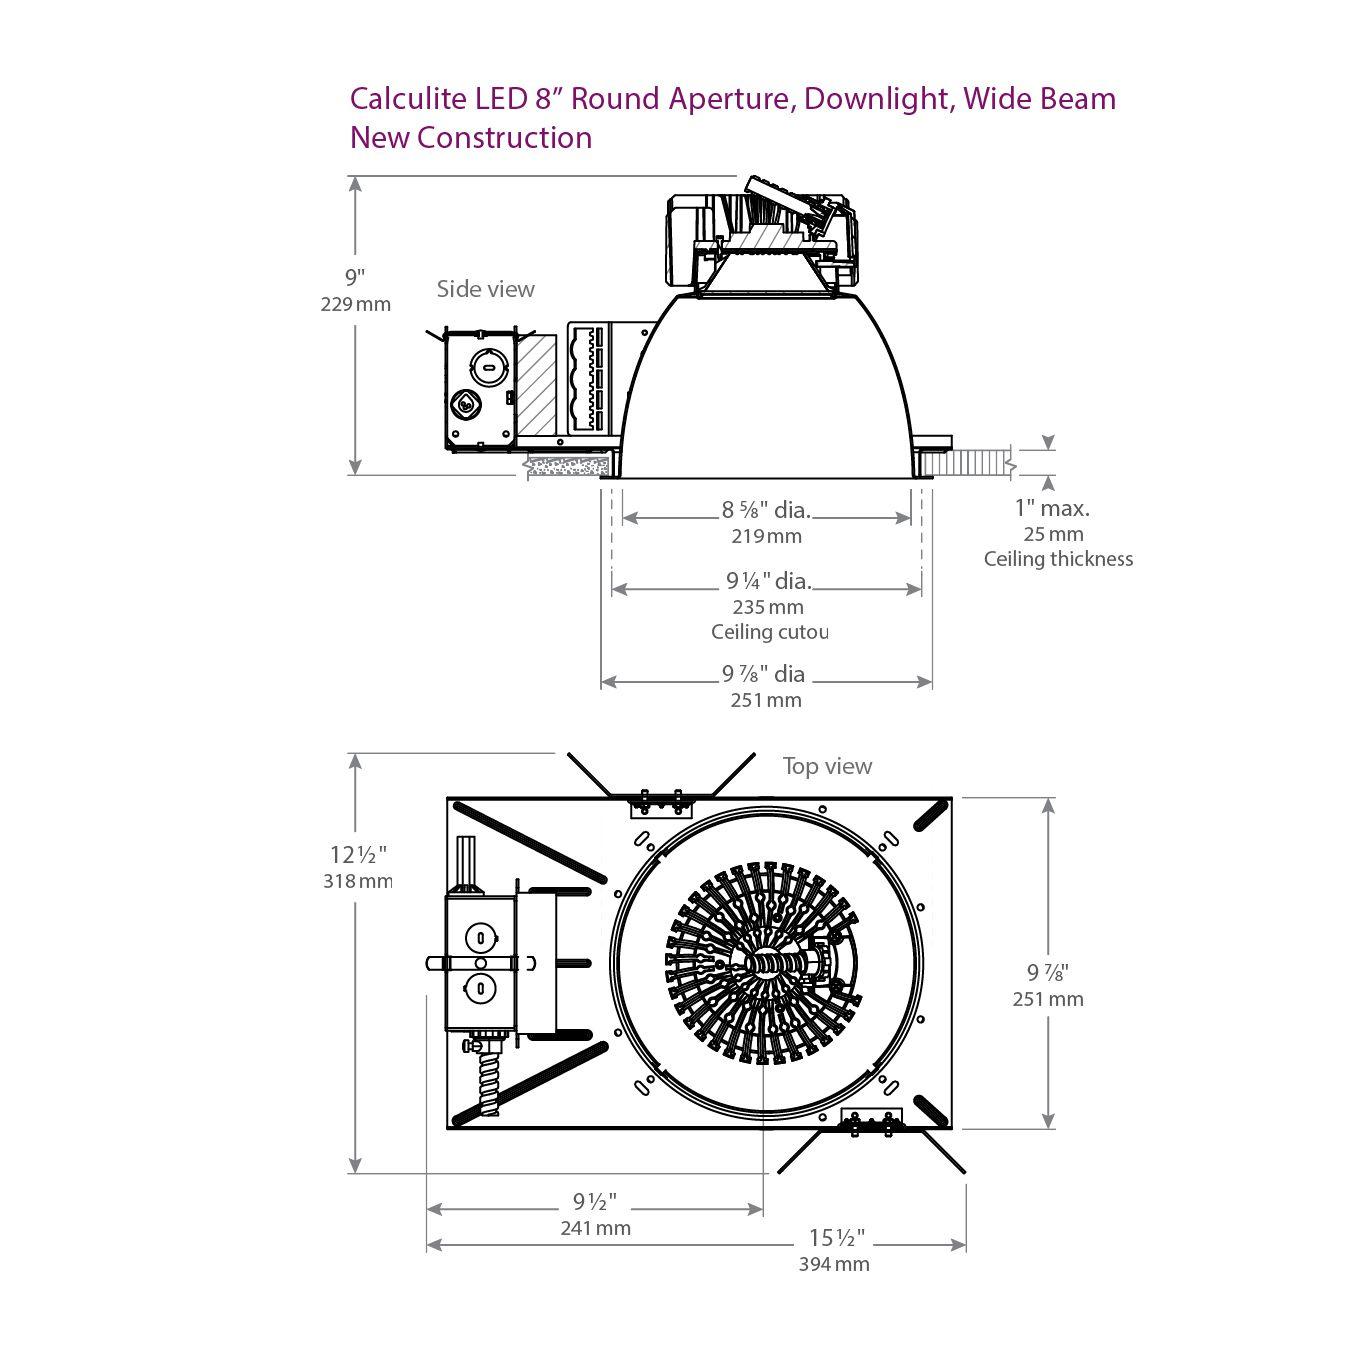 lightolier c8l35n calculite led 8 u0026quot  round aperture wide beam 3500 lumen downlight